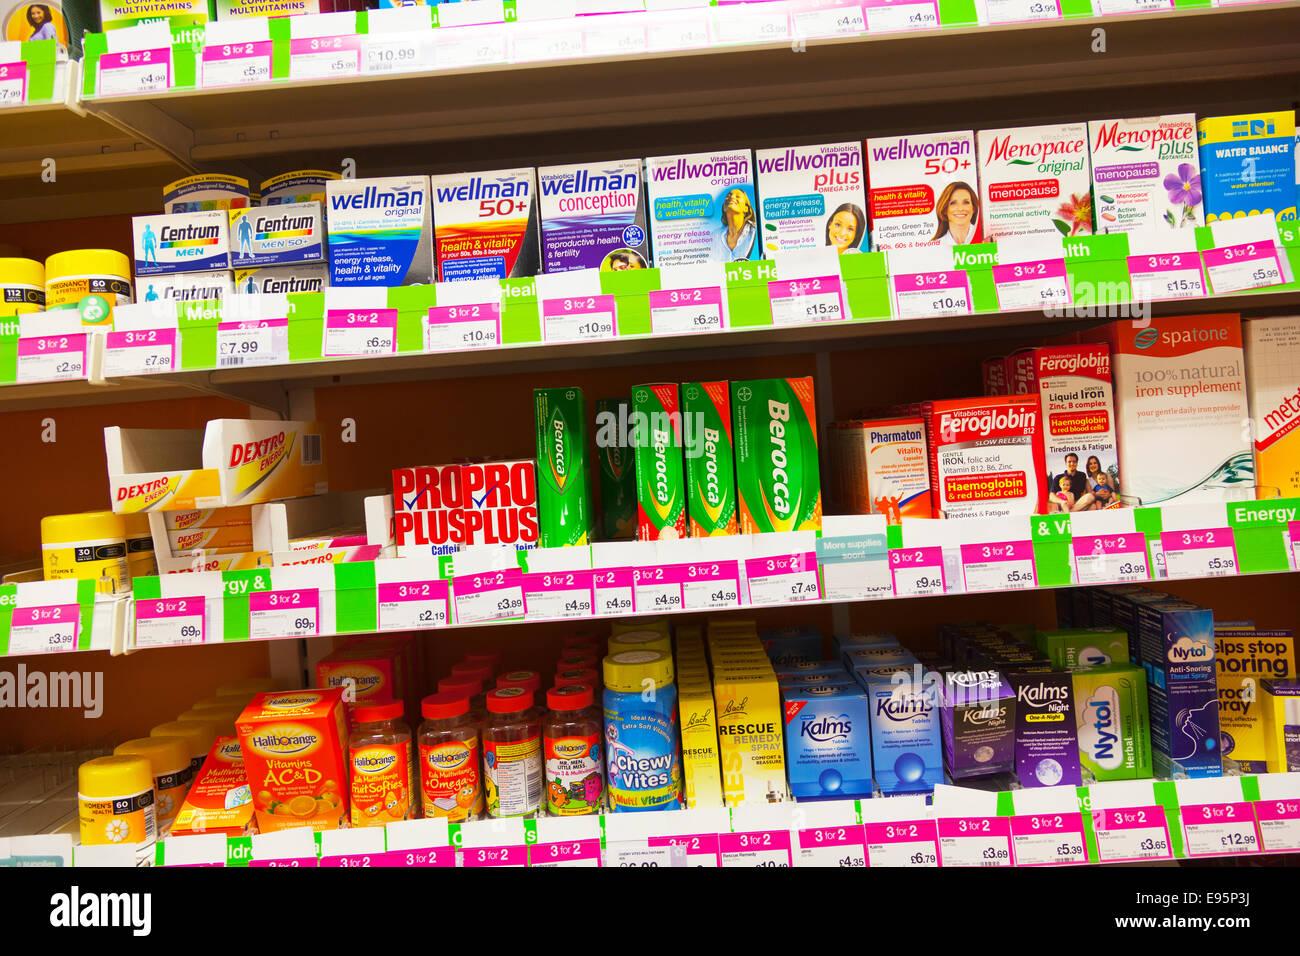 Wellman berocca vitamins health vitality product products on shelf at chemist Chemists shop store inside display - Stock Image